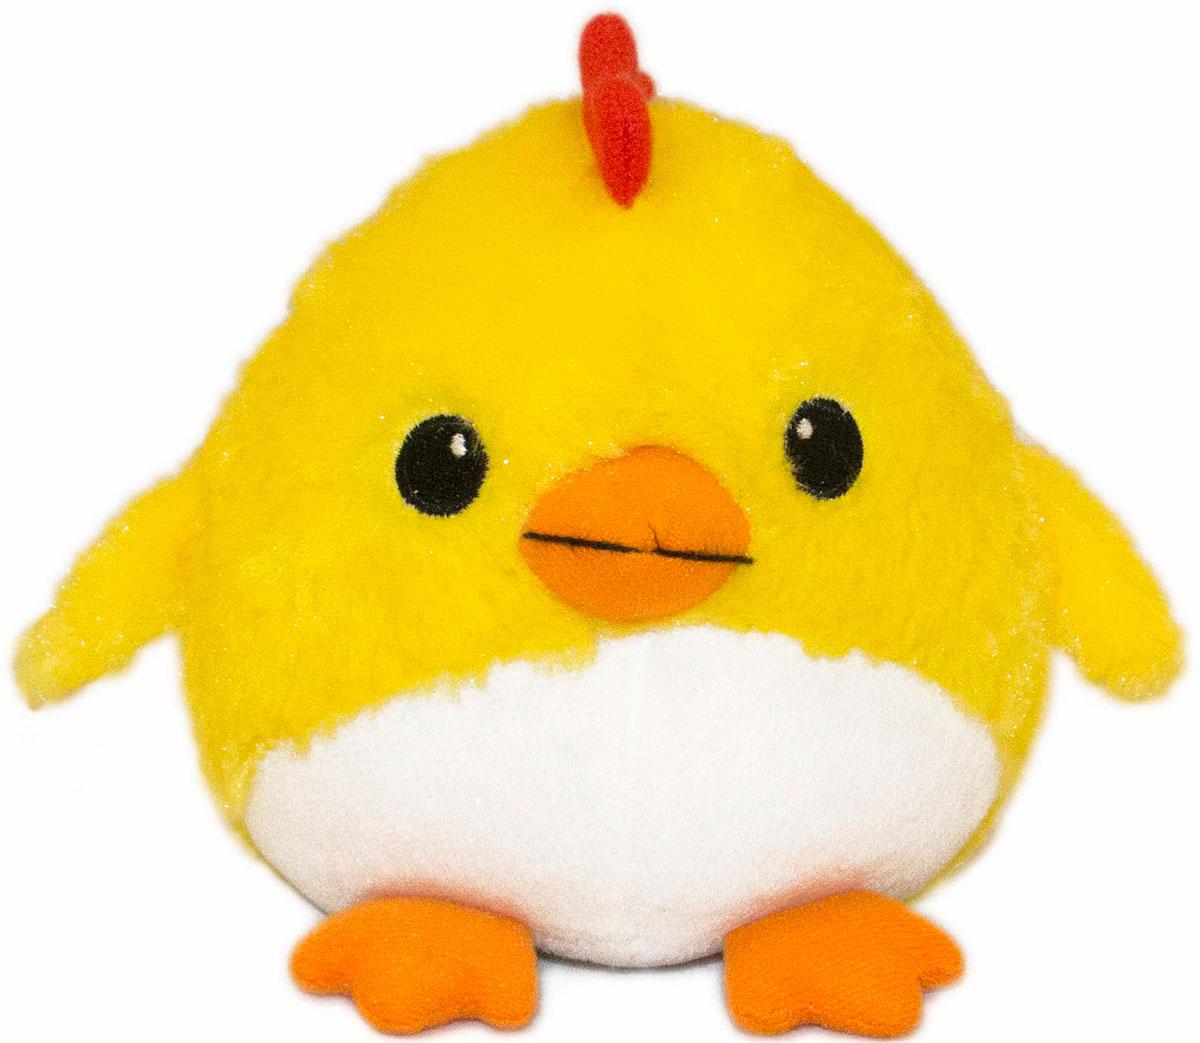 Gulliver Мягкая игрушка Цыпленок Солнышко 12 см 66-OT159347-1